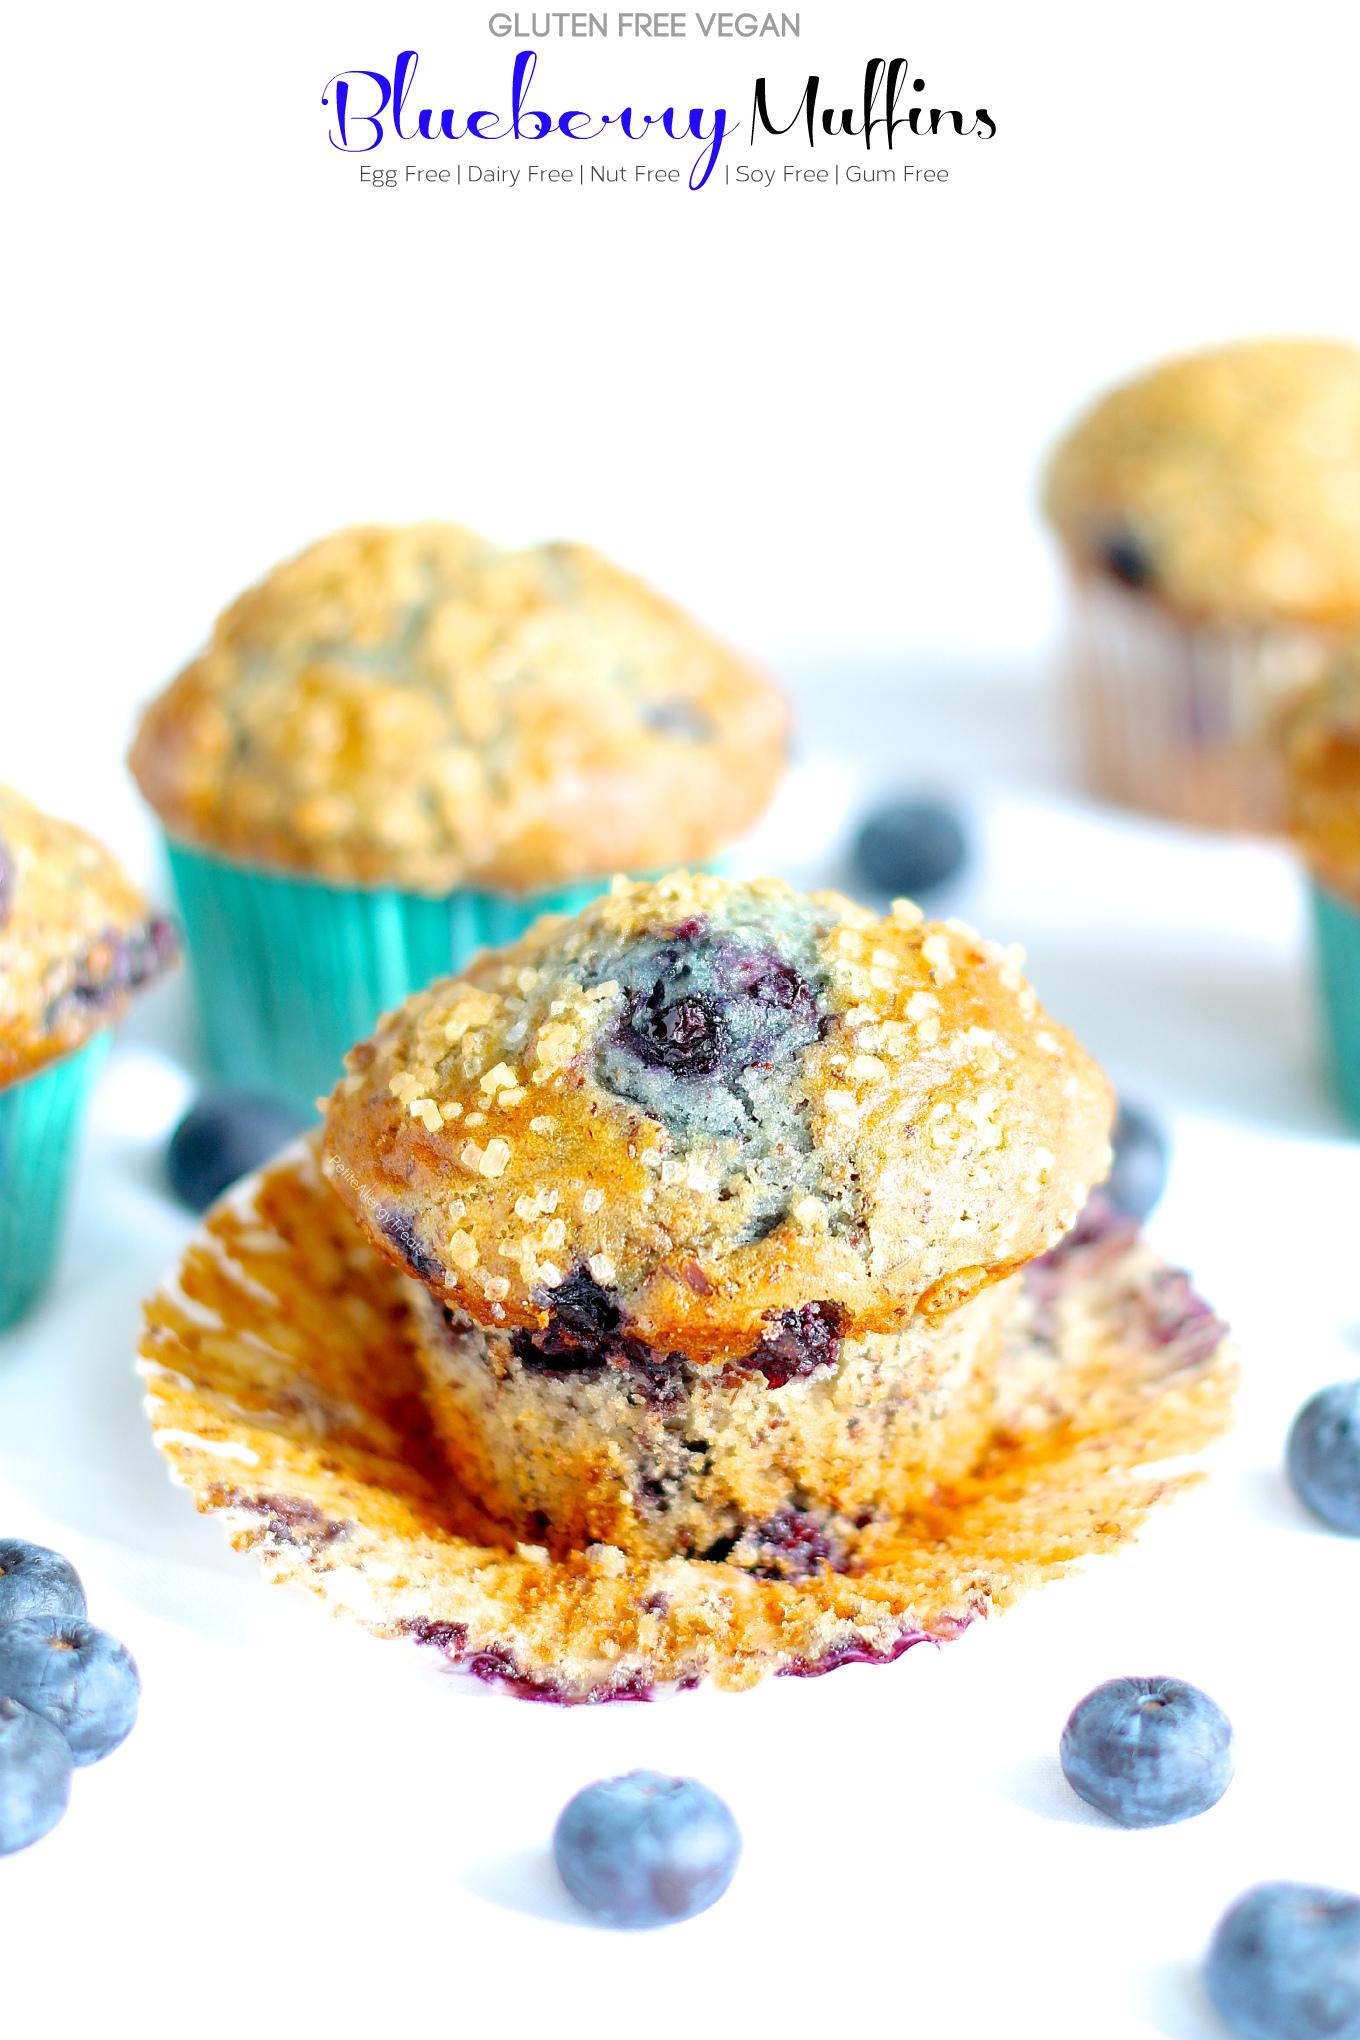 Gluten Free Vegan Blueberry Muffins (dairy free egg free) Recipe- Delicious HUGE Bakery style gluten free blueberry muffins! Super #FoodAllergy friendly- #dairyfree, #eggfree, #nutfree #soyfree